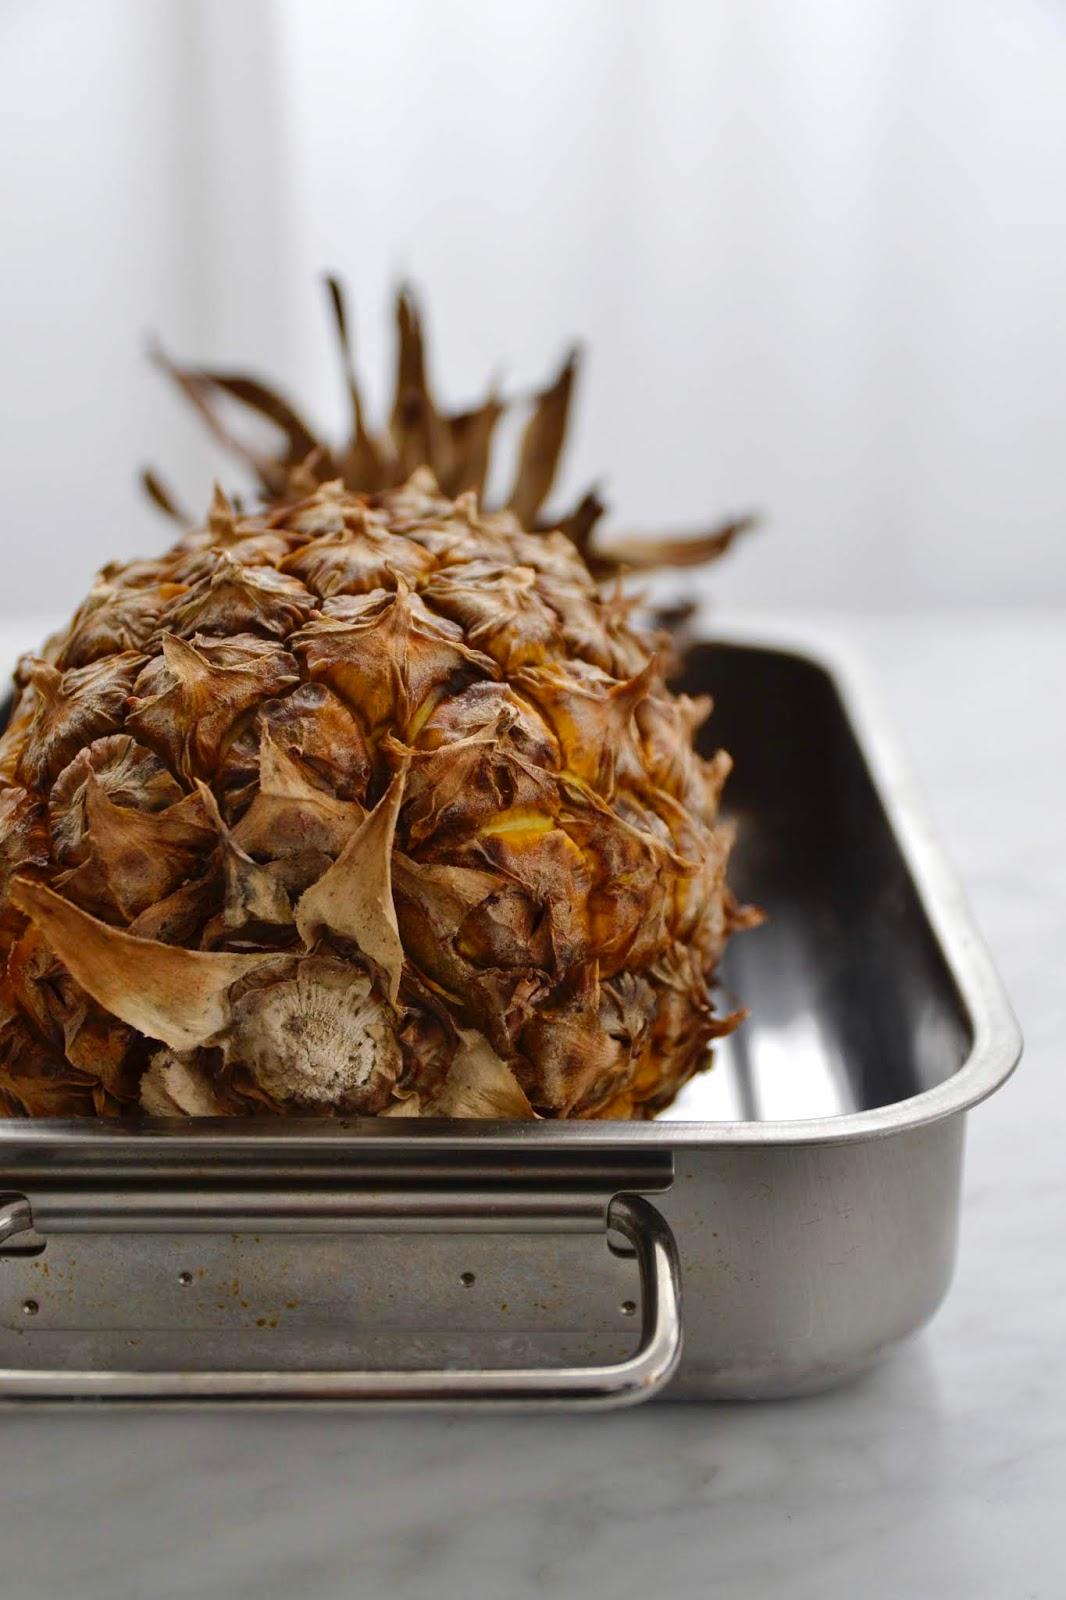 Ananas Roti Au Four : ananas, Simple, Comme, Ananas, Entier,, Rôti, Cuisine, C'est